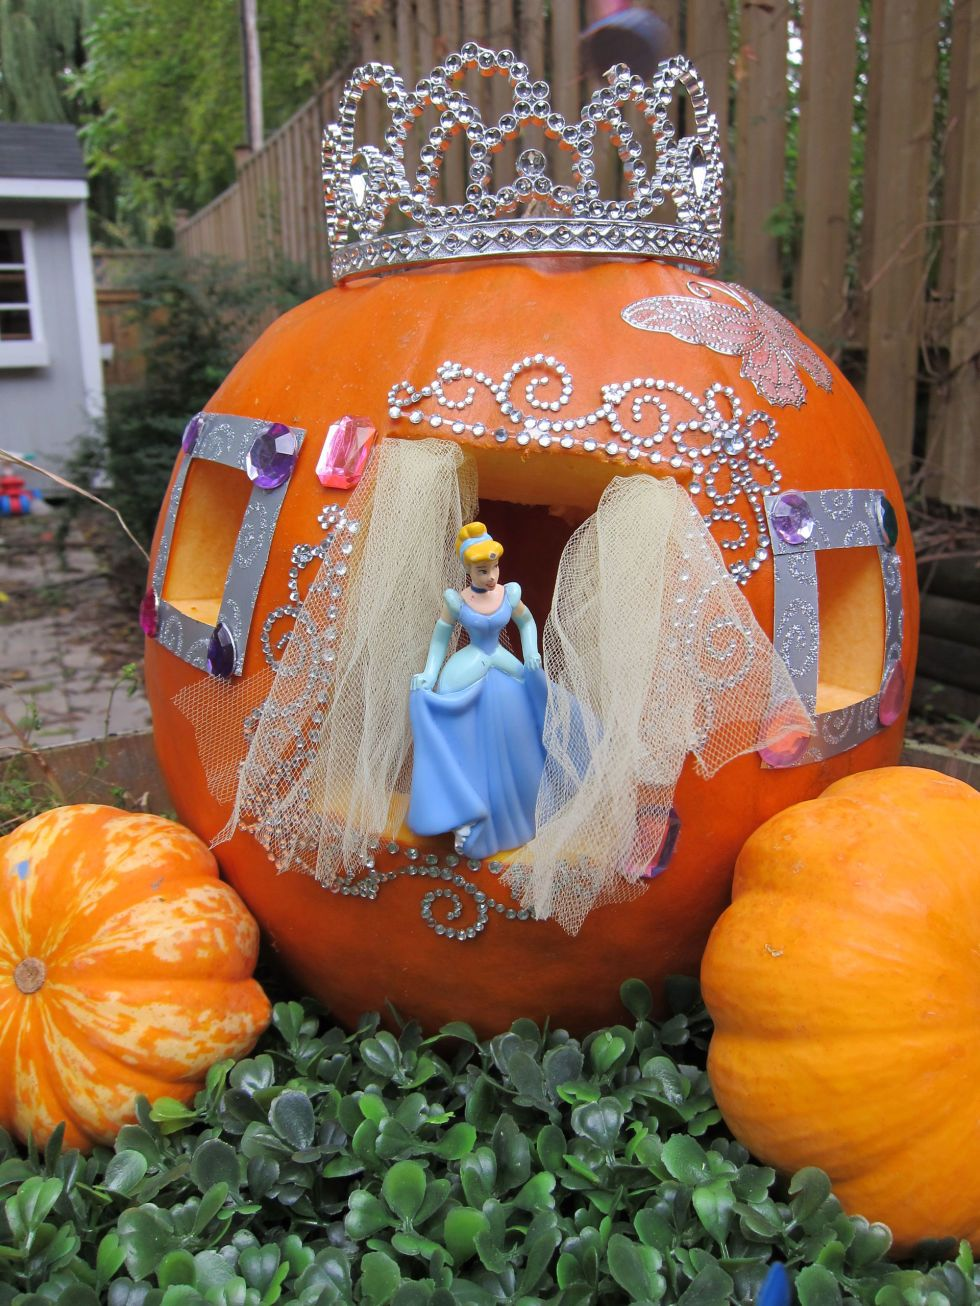 The 32 Best Pumpkin Decorating Ideas You Ve Ever Seen Pumpkin Decorating Easy Pumpkin Decorating Pumkin Decoration